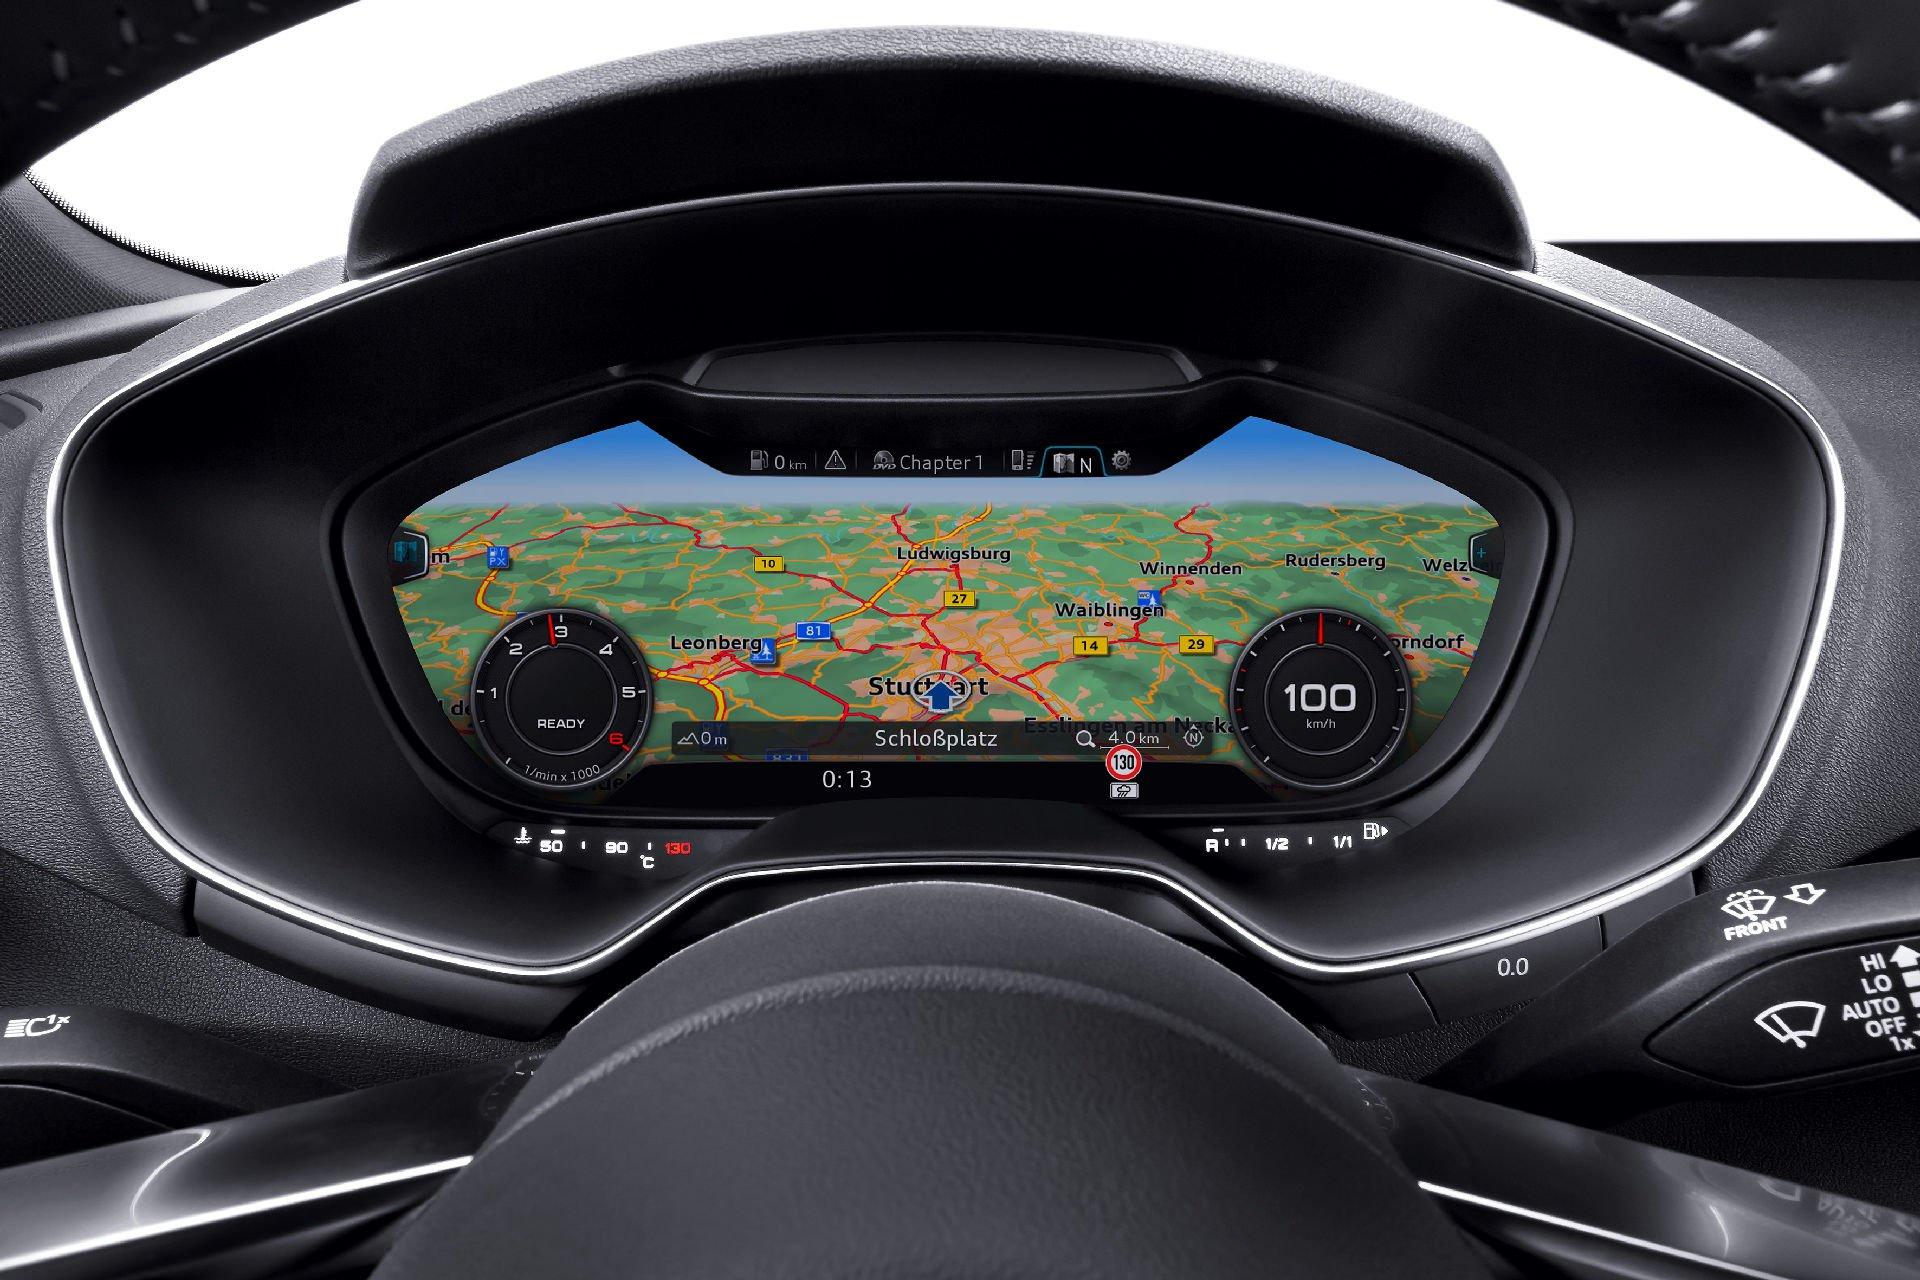 Bosch-3D-cockpit-display-5